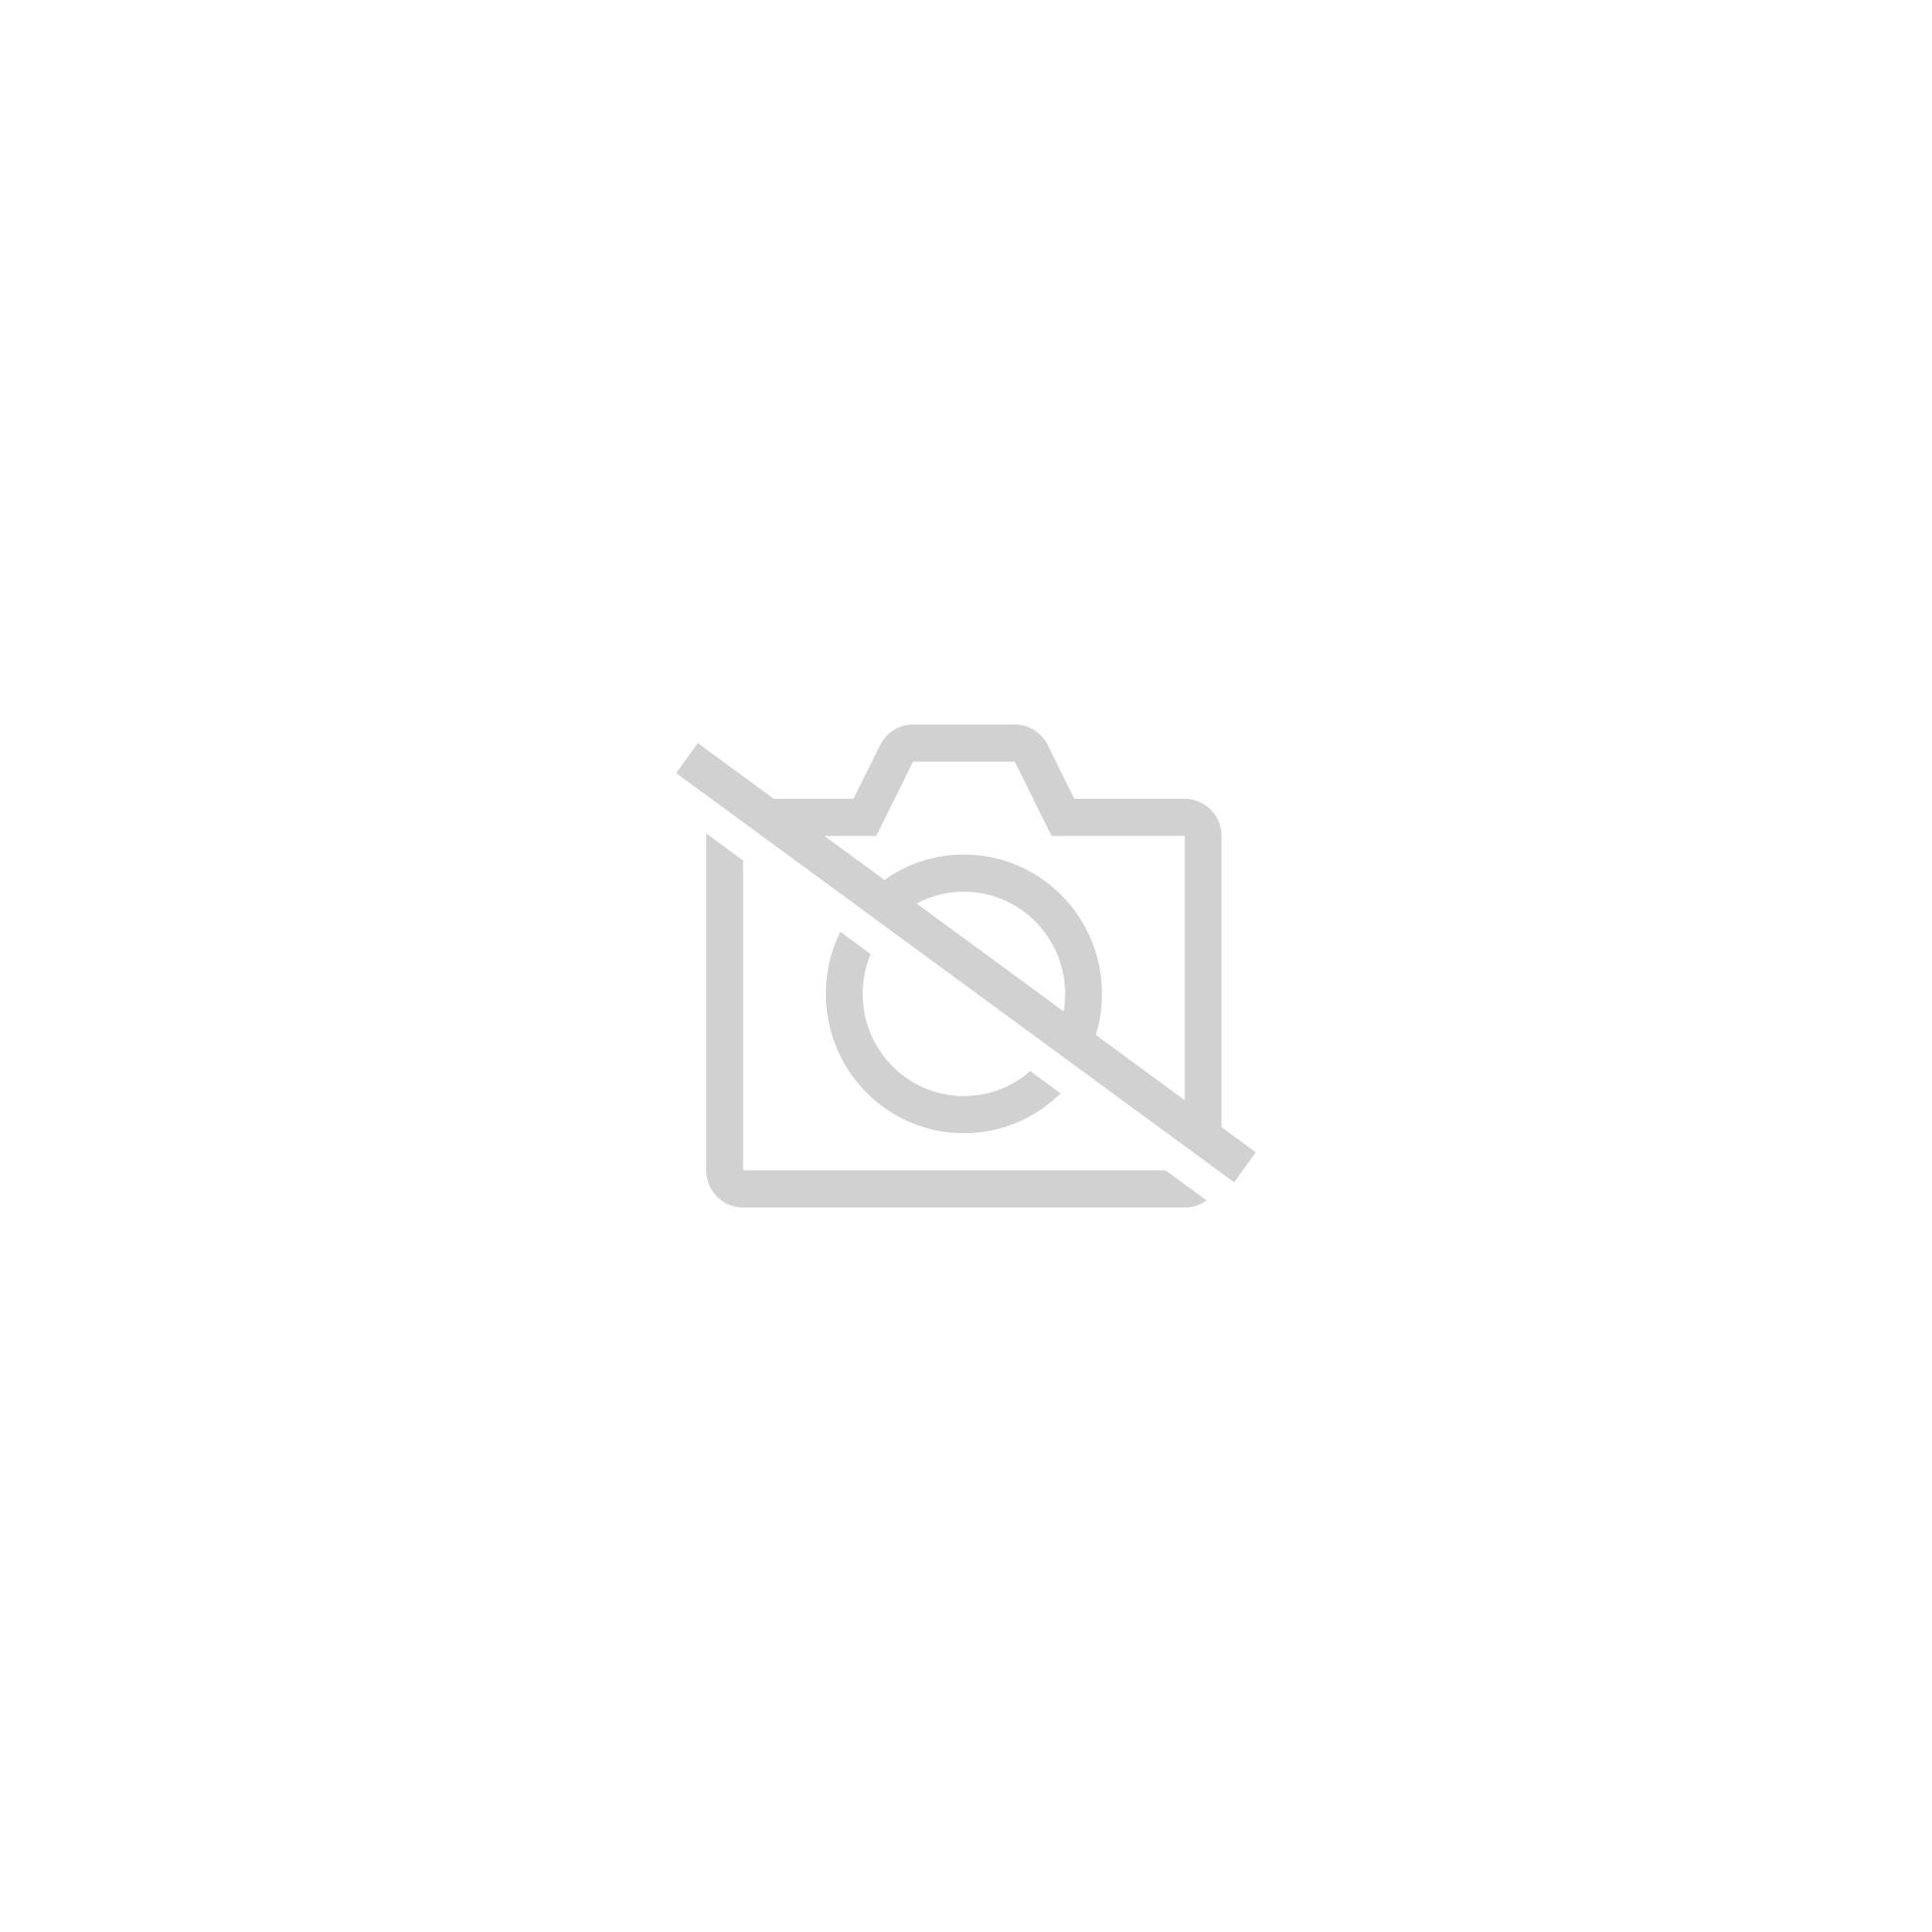 Ruilin Carte Memoire Flash Micro Sd 256 Go Microsdxc Avec Adaptateur Sd Microsdxc Rakuten